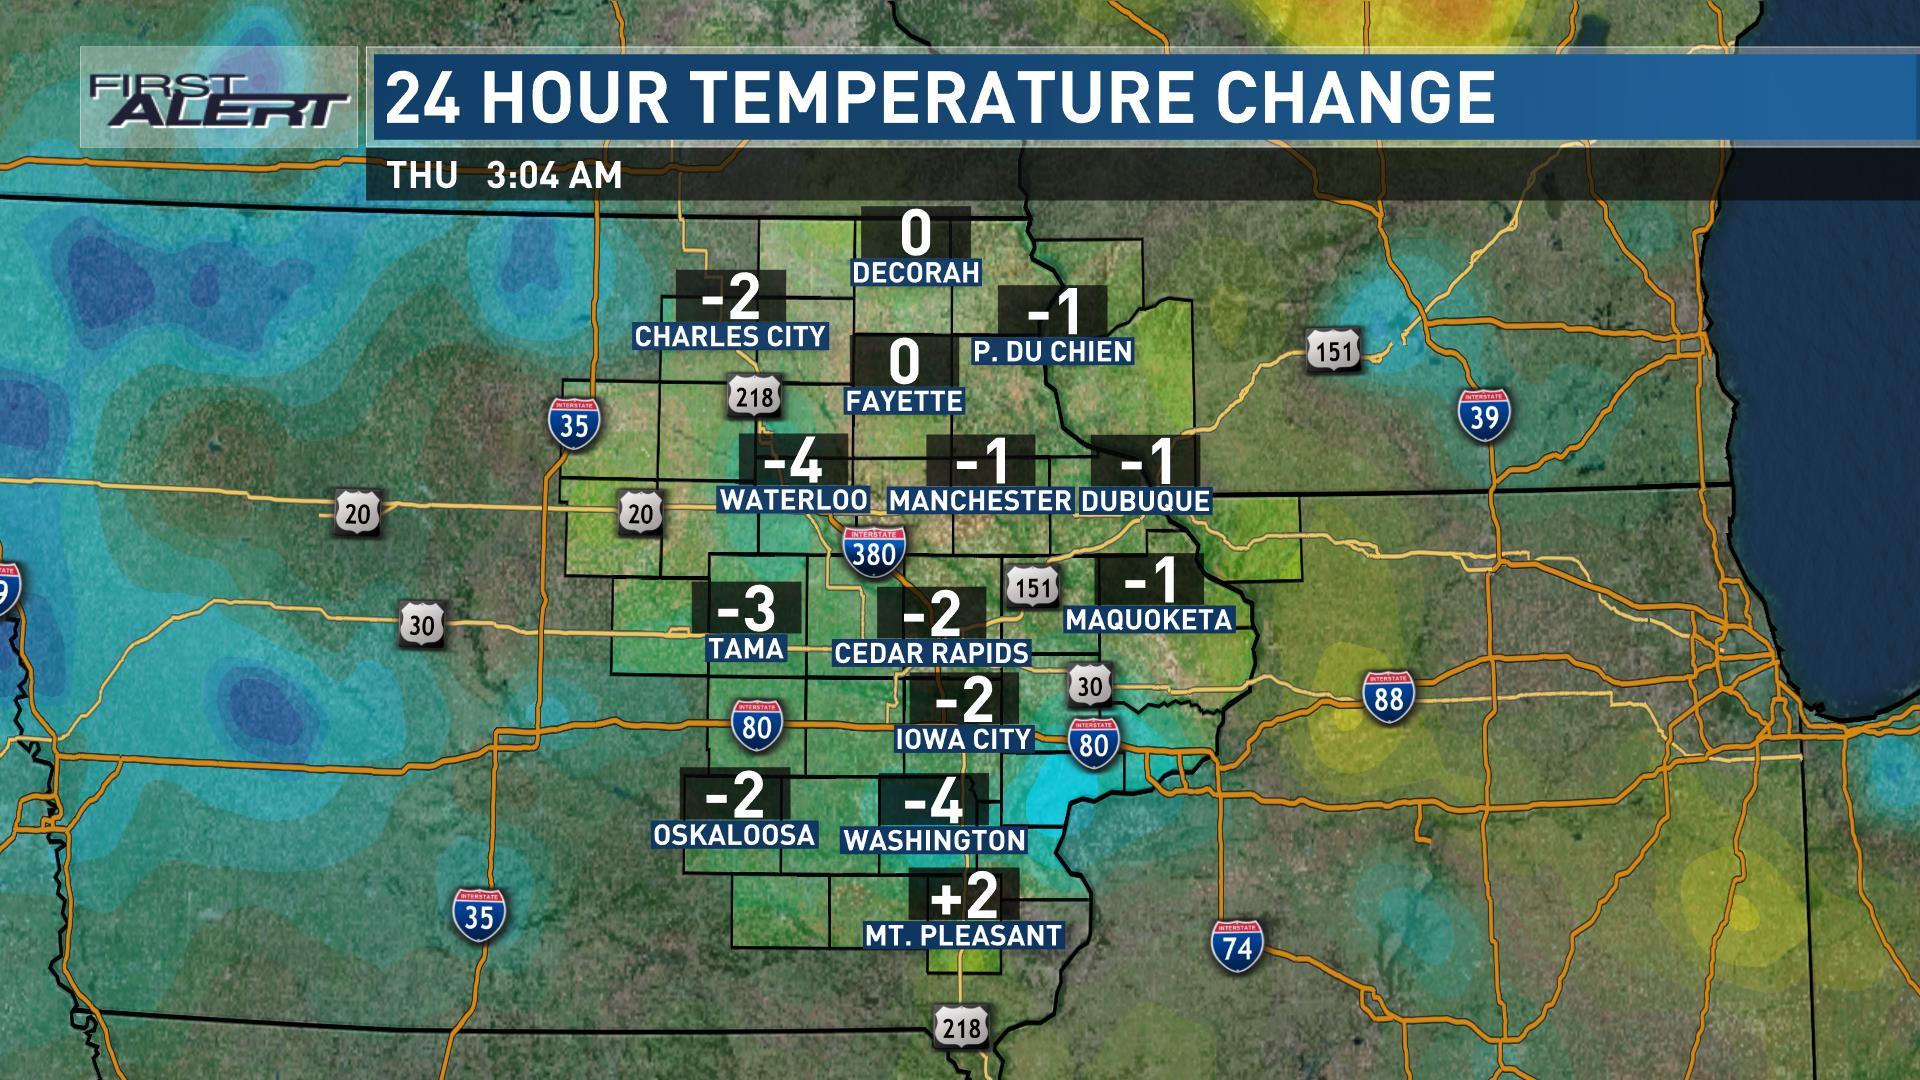 24-Hour Temperature Change